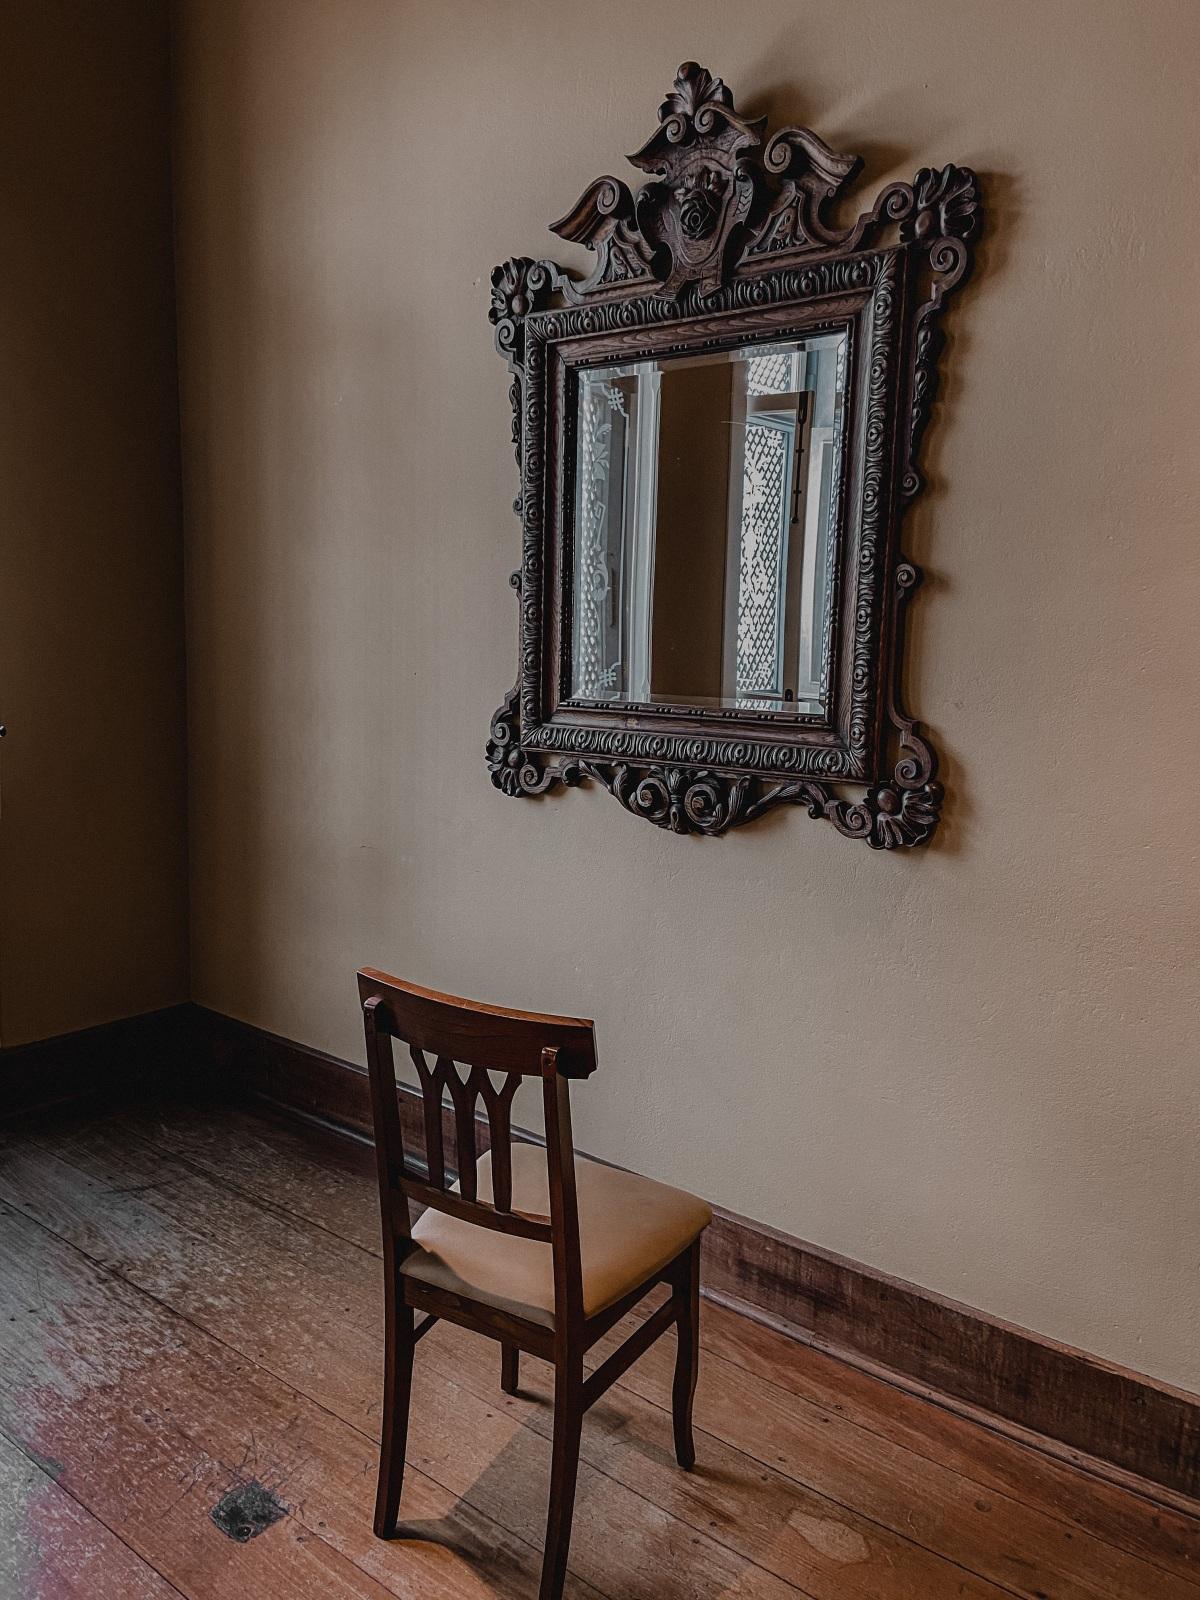 empty chair facing a mirror